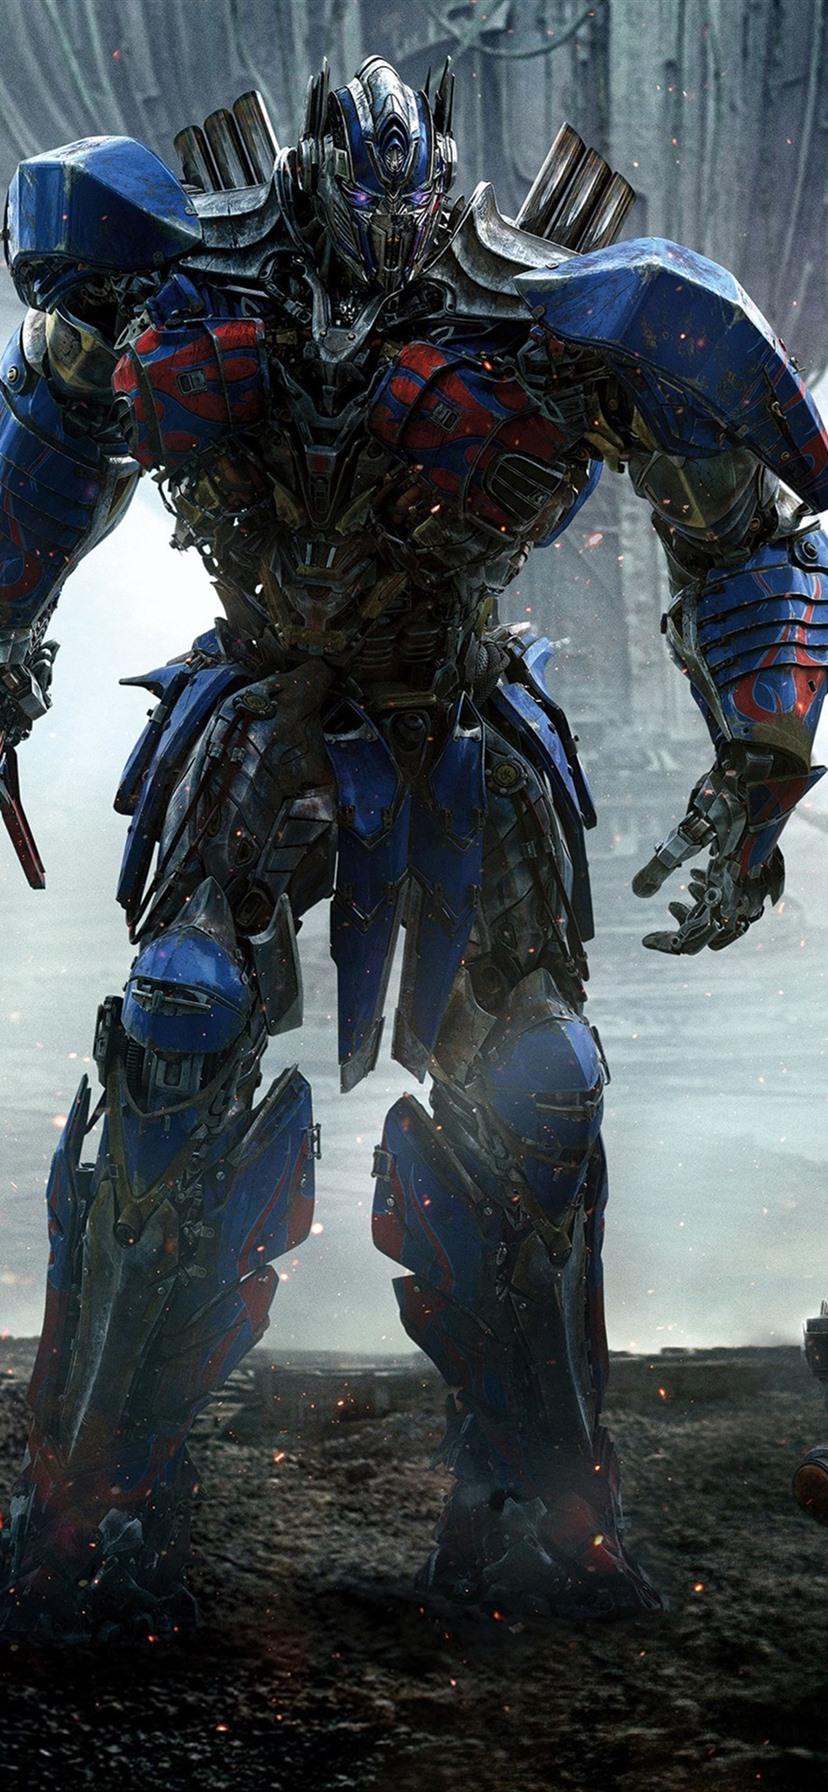 Wallpaper Transformers 5 Optimus Prime And Bumblebee